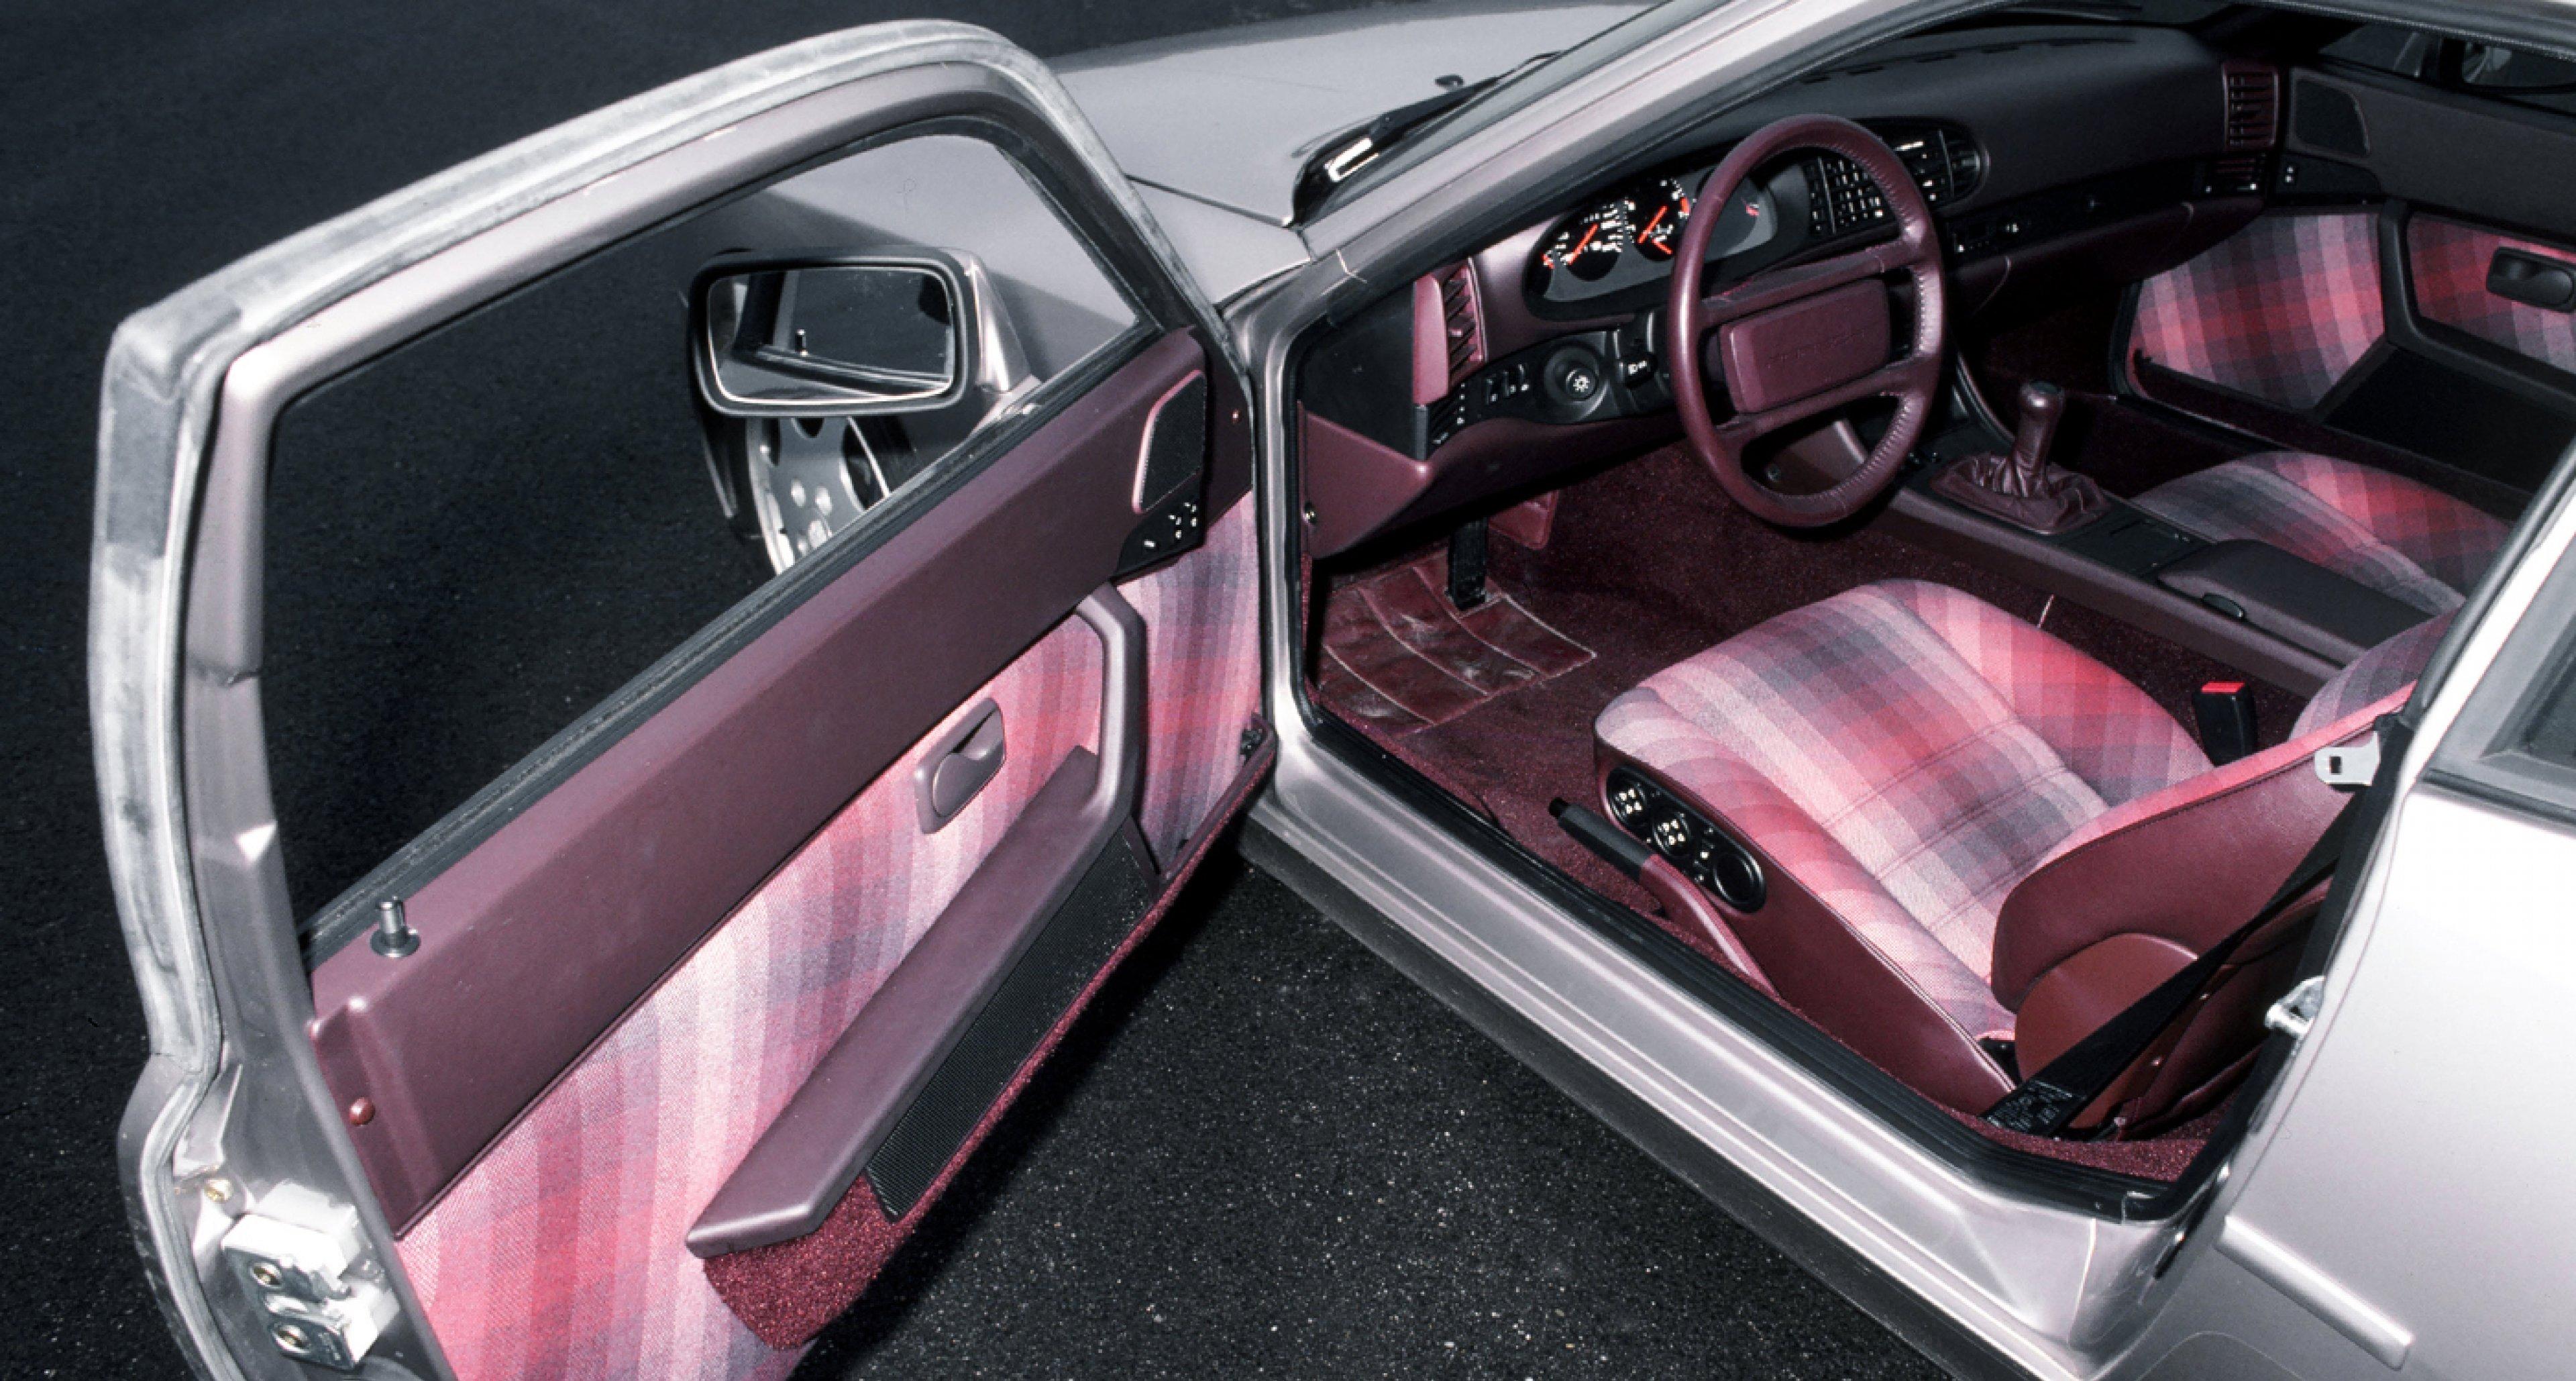 Interior of a 1988 Porsche 944 Turbo S.